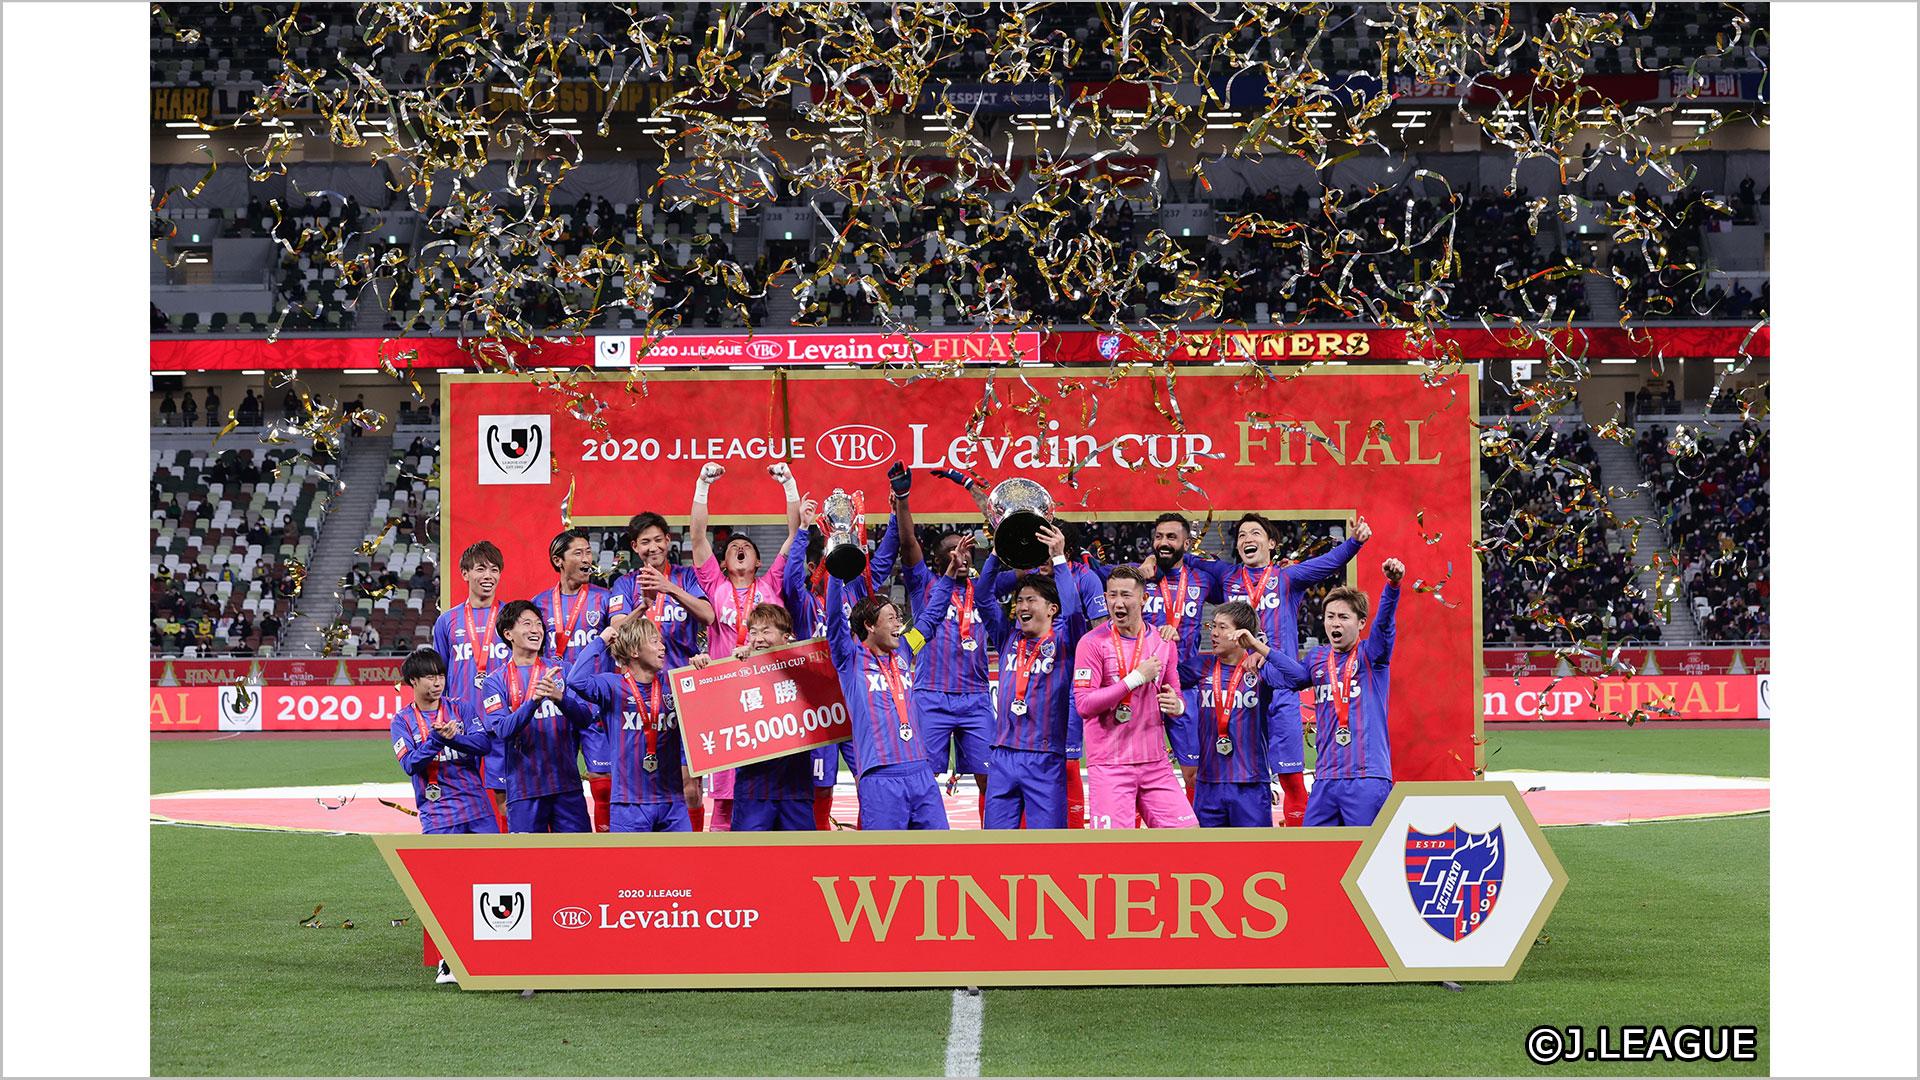 2021 JリーグYBCルヴァンカップ 湘南ベルマーレ vs 浦和レッズ